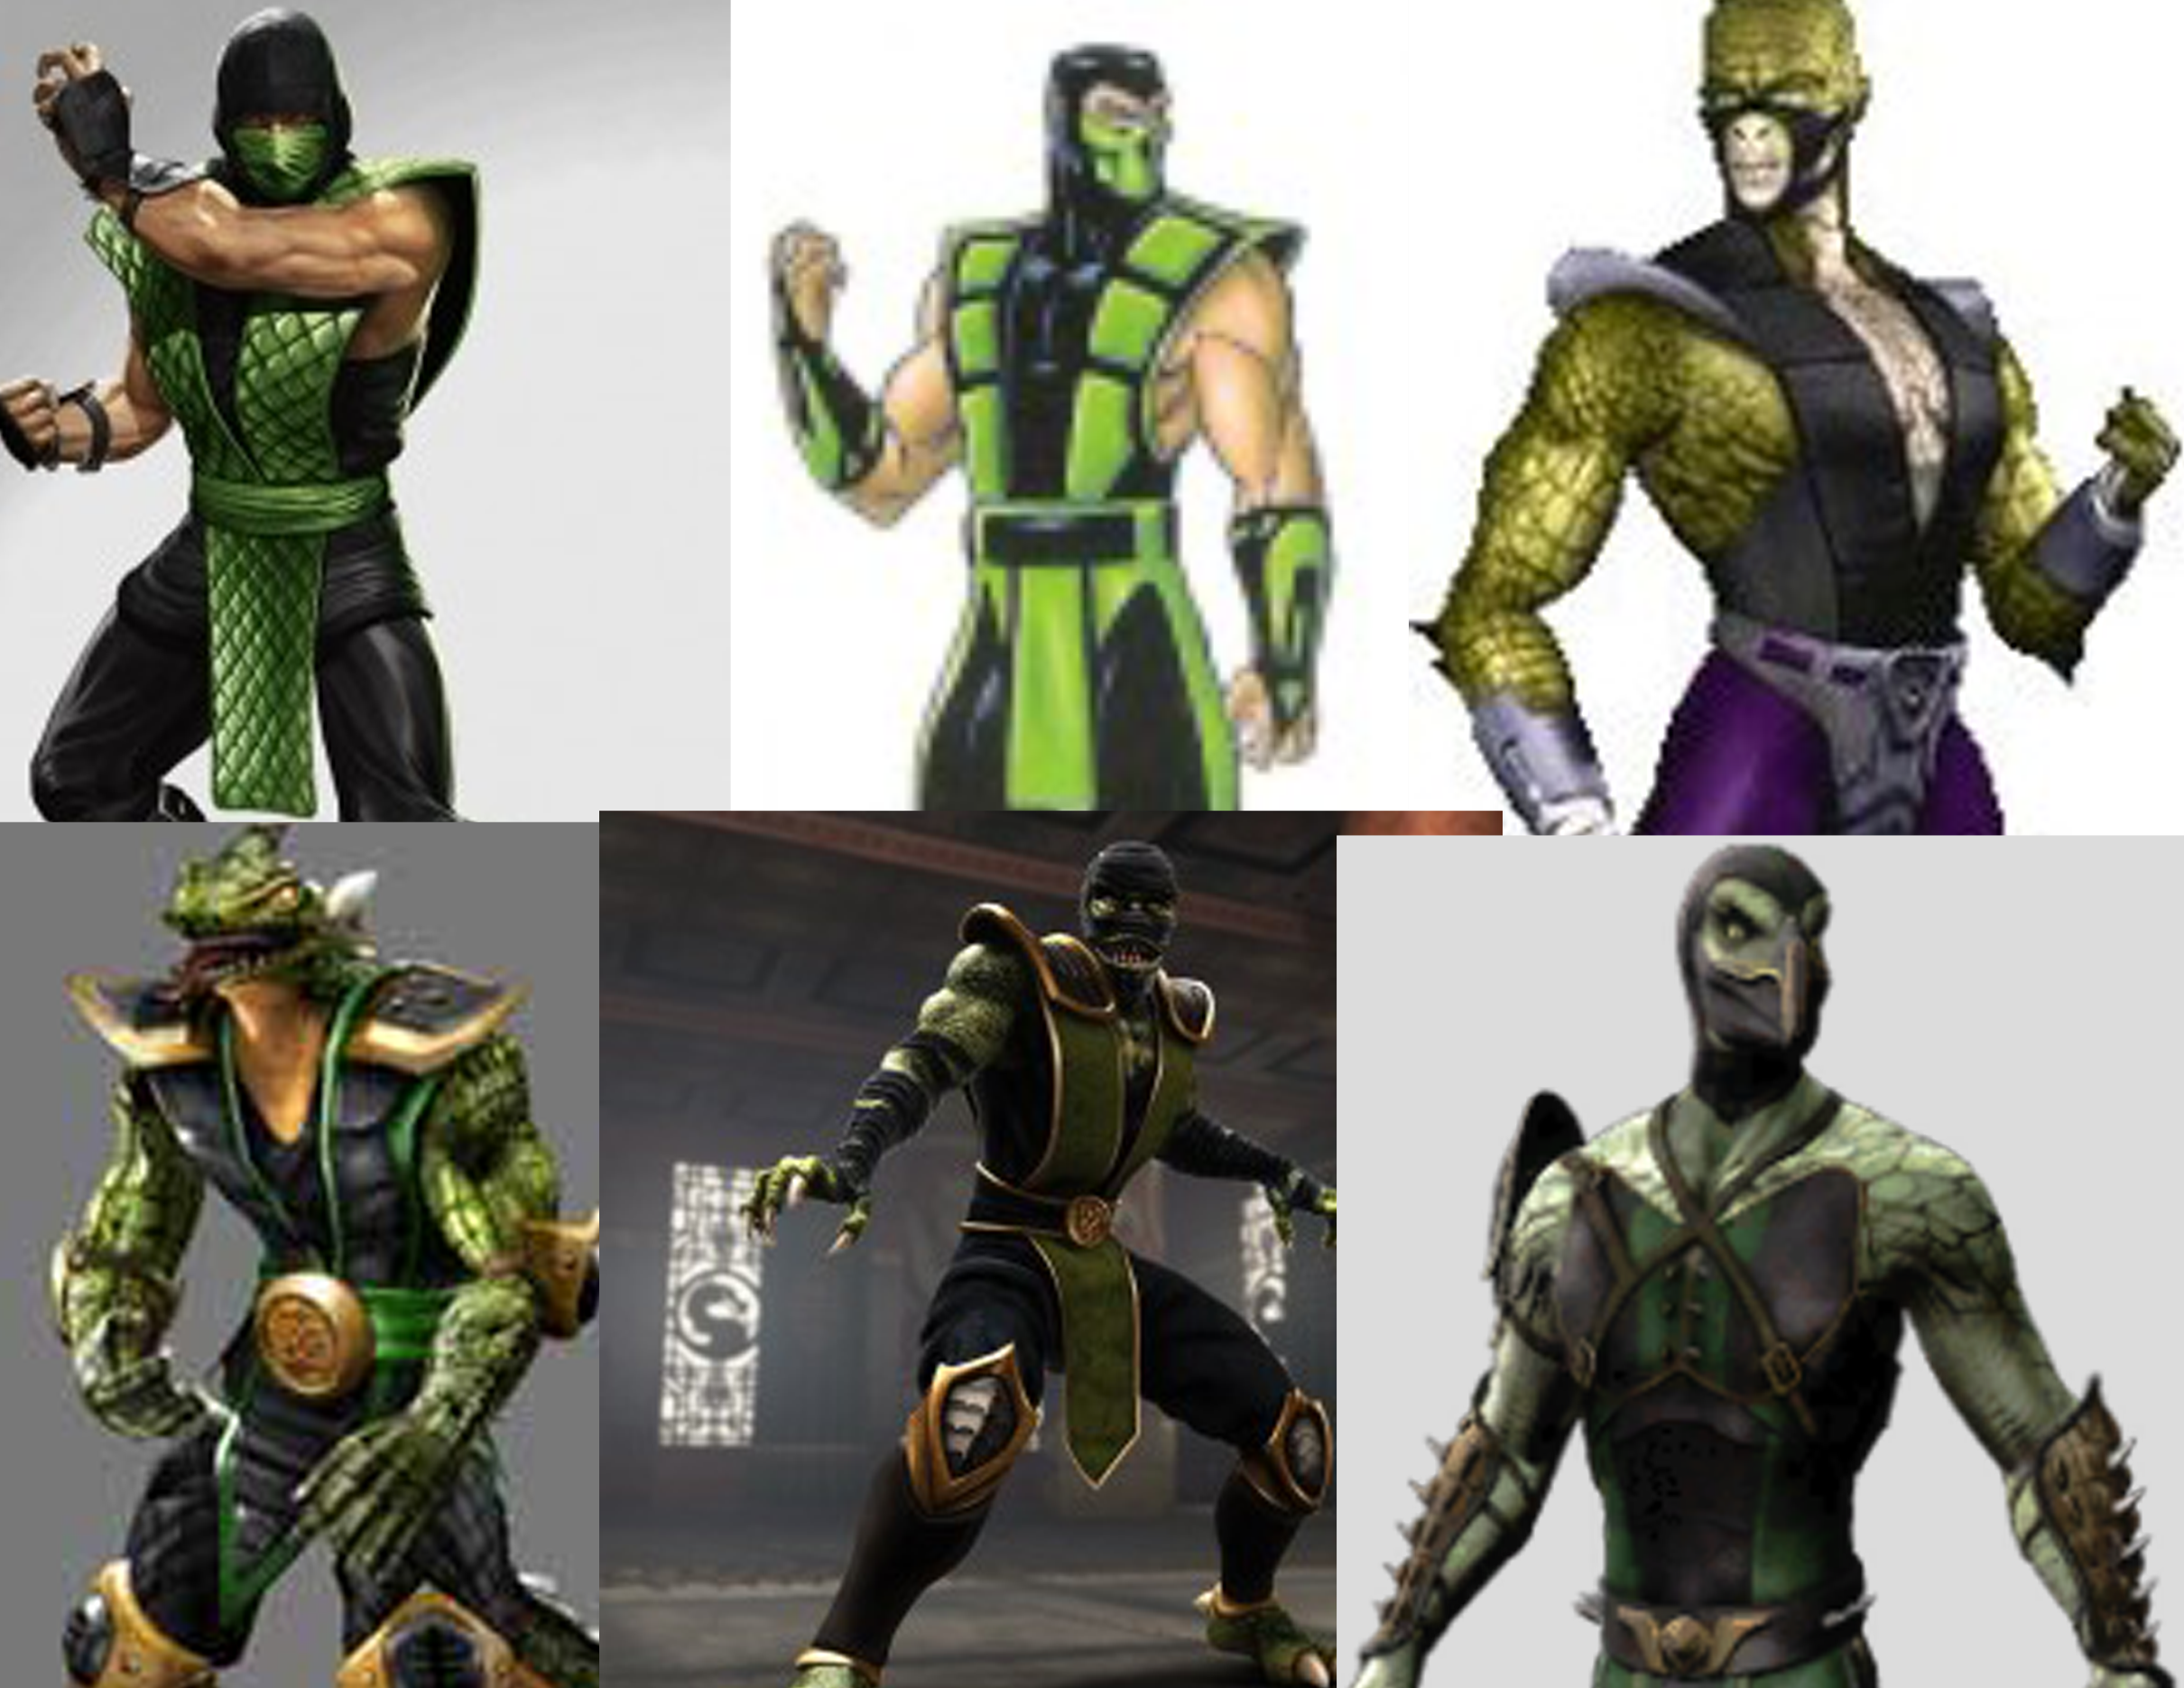 Mortal Kombat 9 2011 Unlockable Alternate Costume